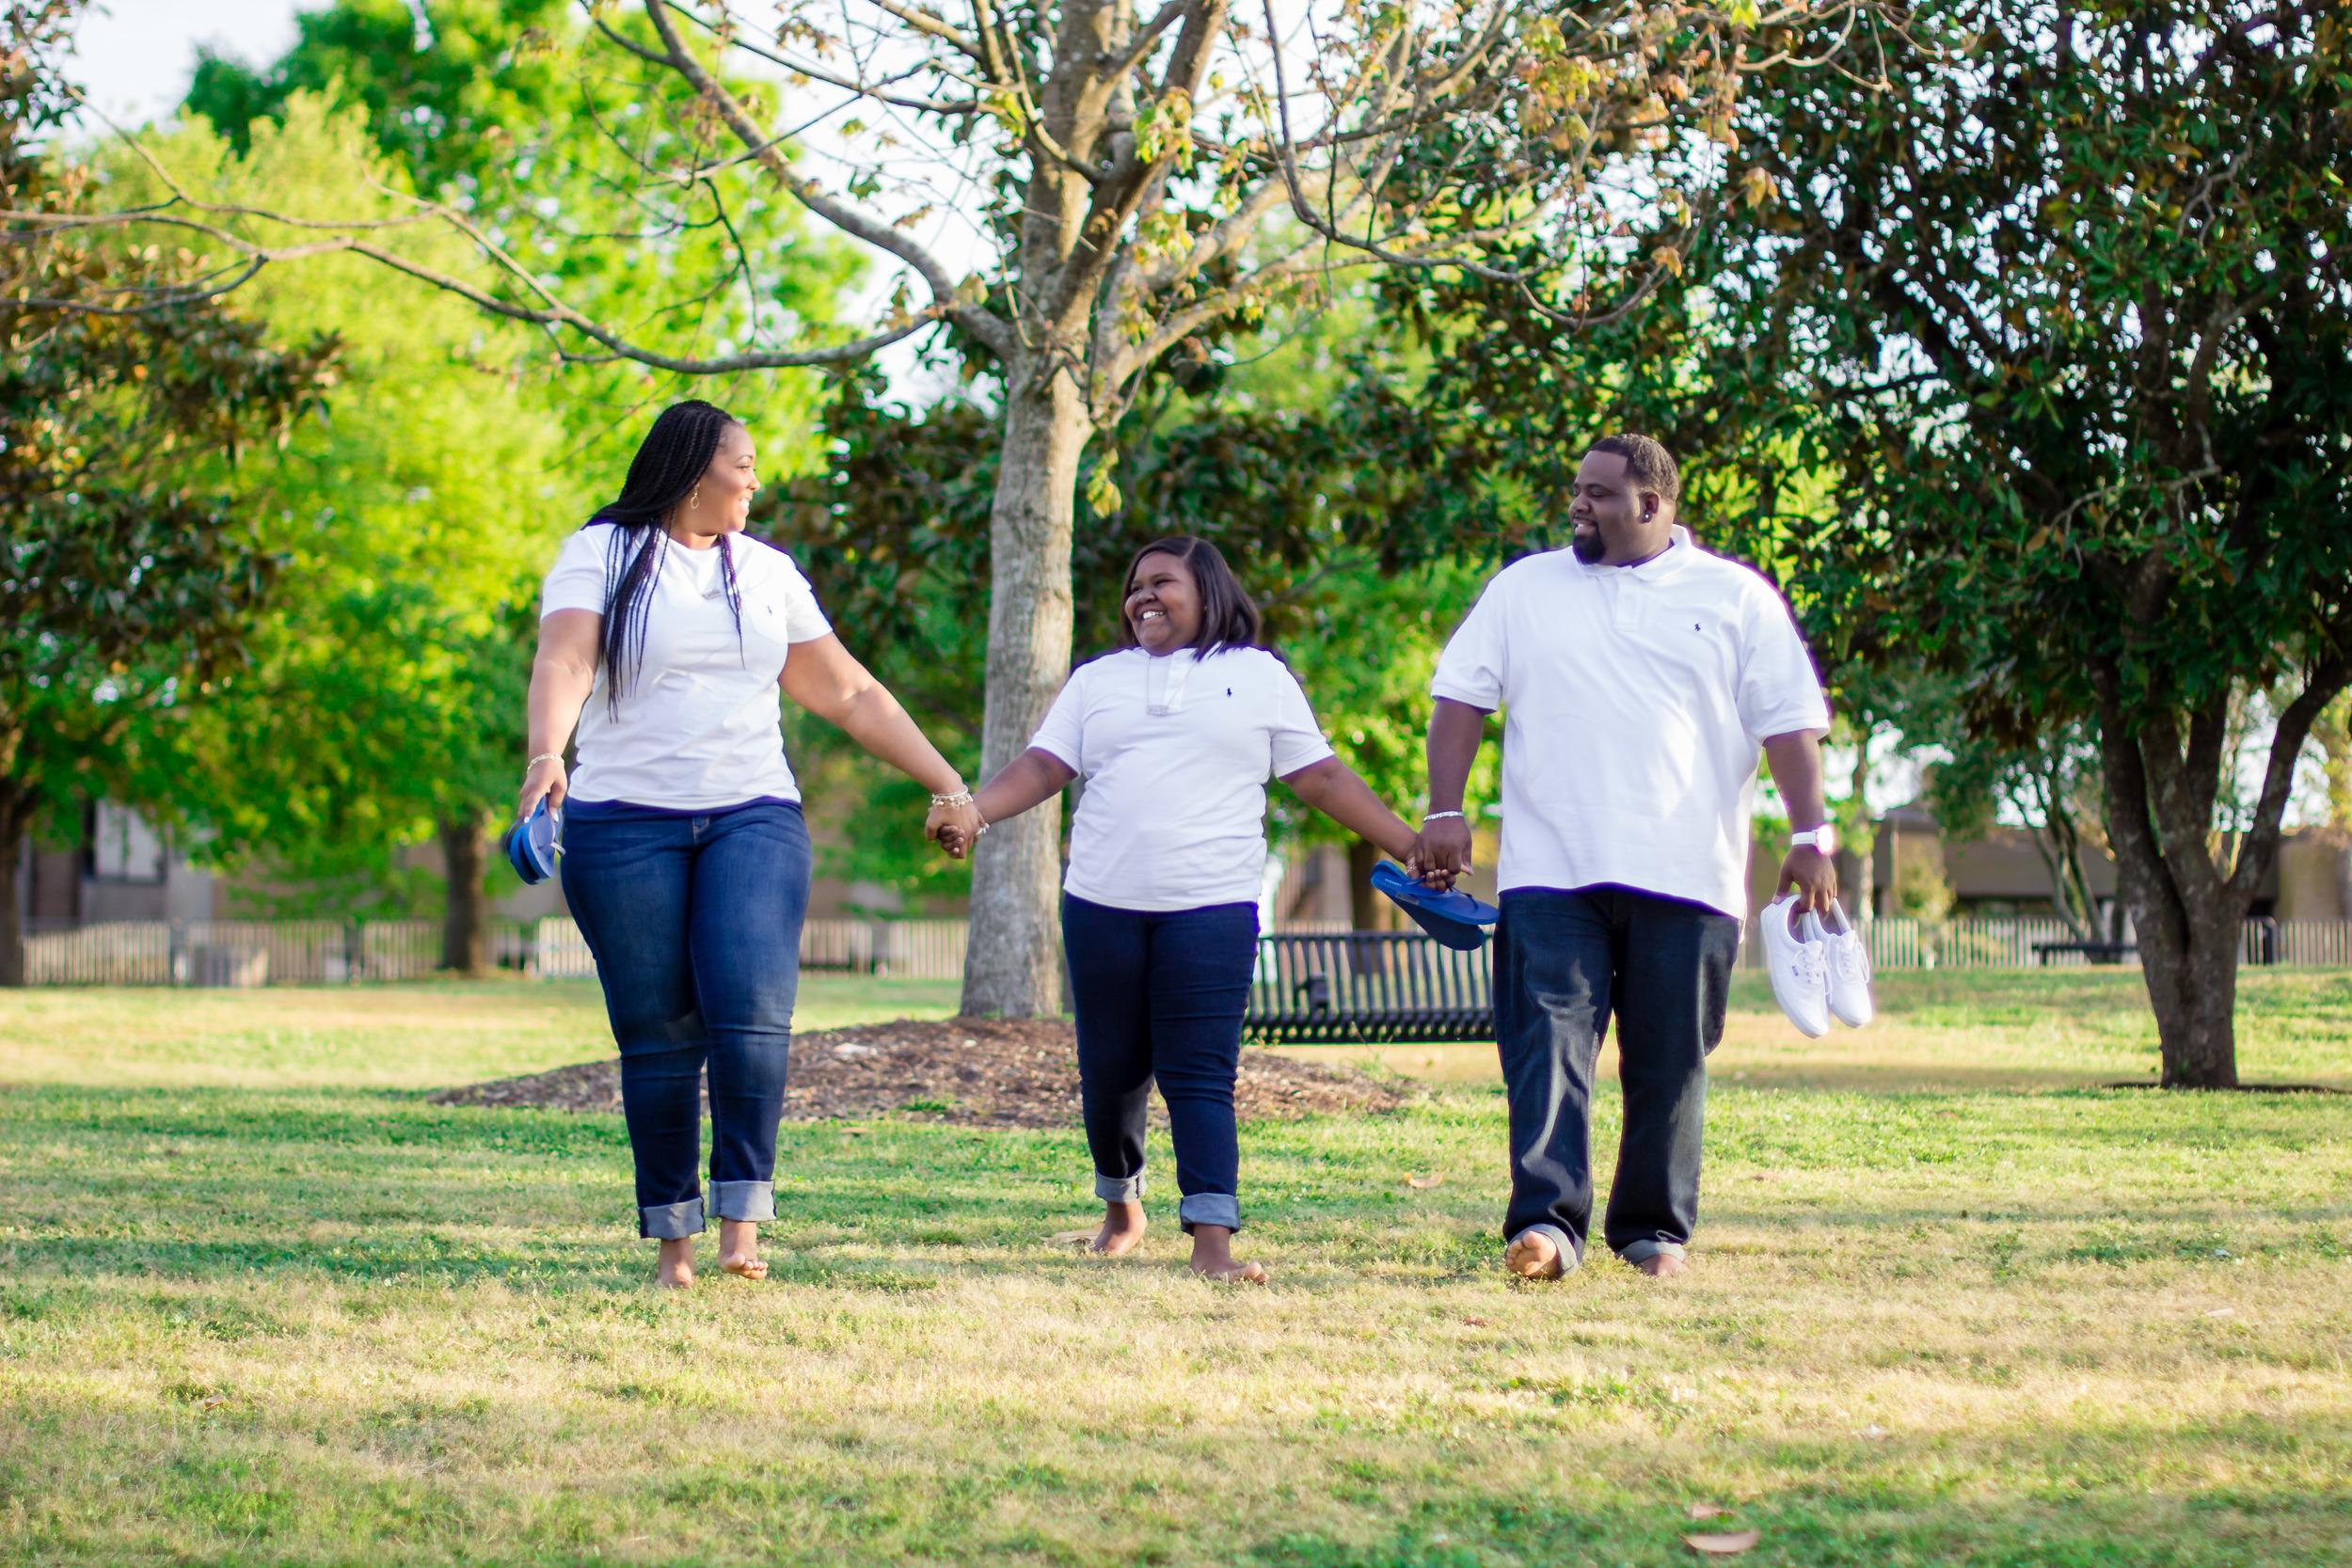 Greenville NC Family Portraits   Bryant Tyson Photography   Tonya Smith